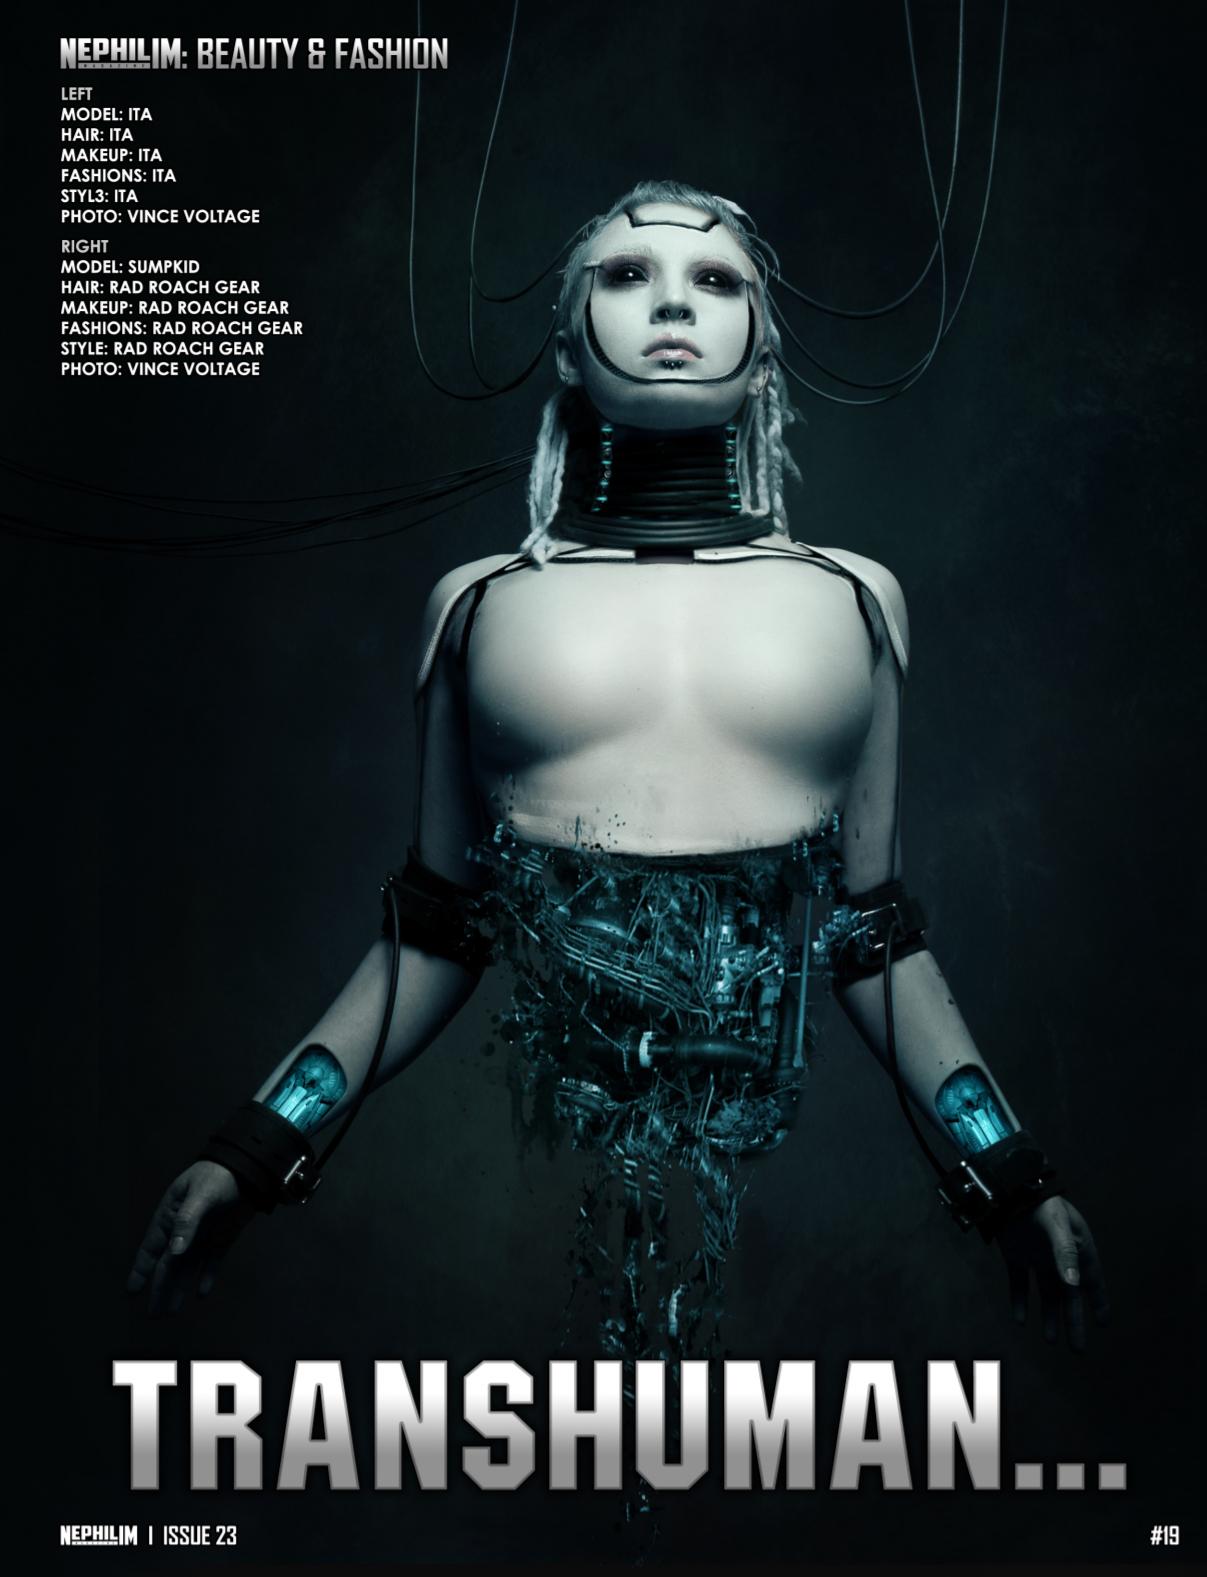 Nephilim Mag March 2020.4